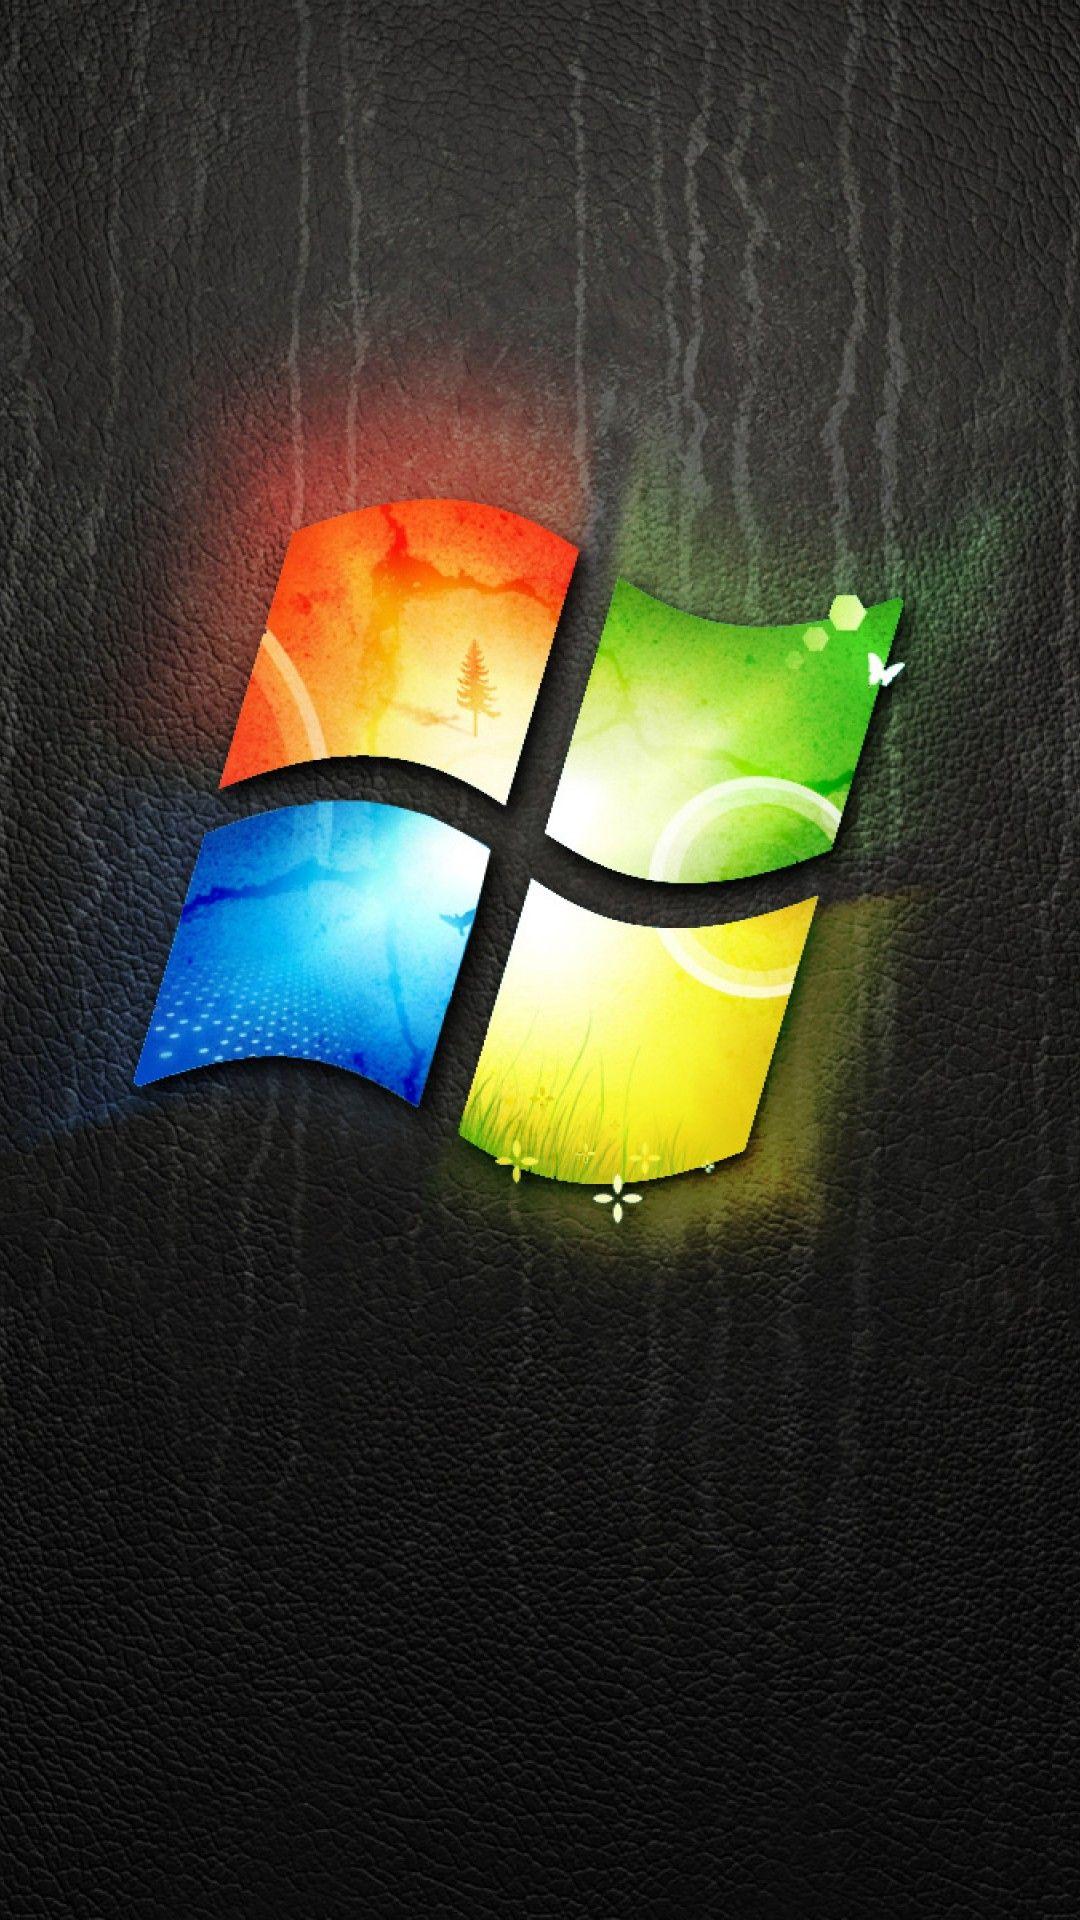 Theme Microsoft Broken Screen